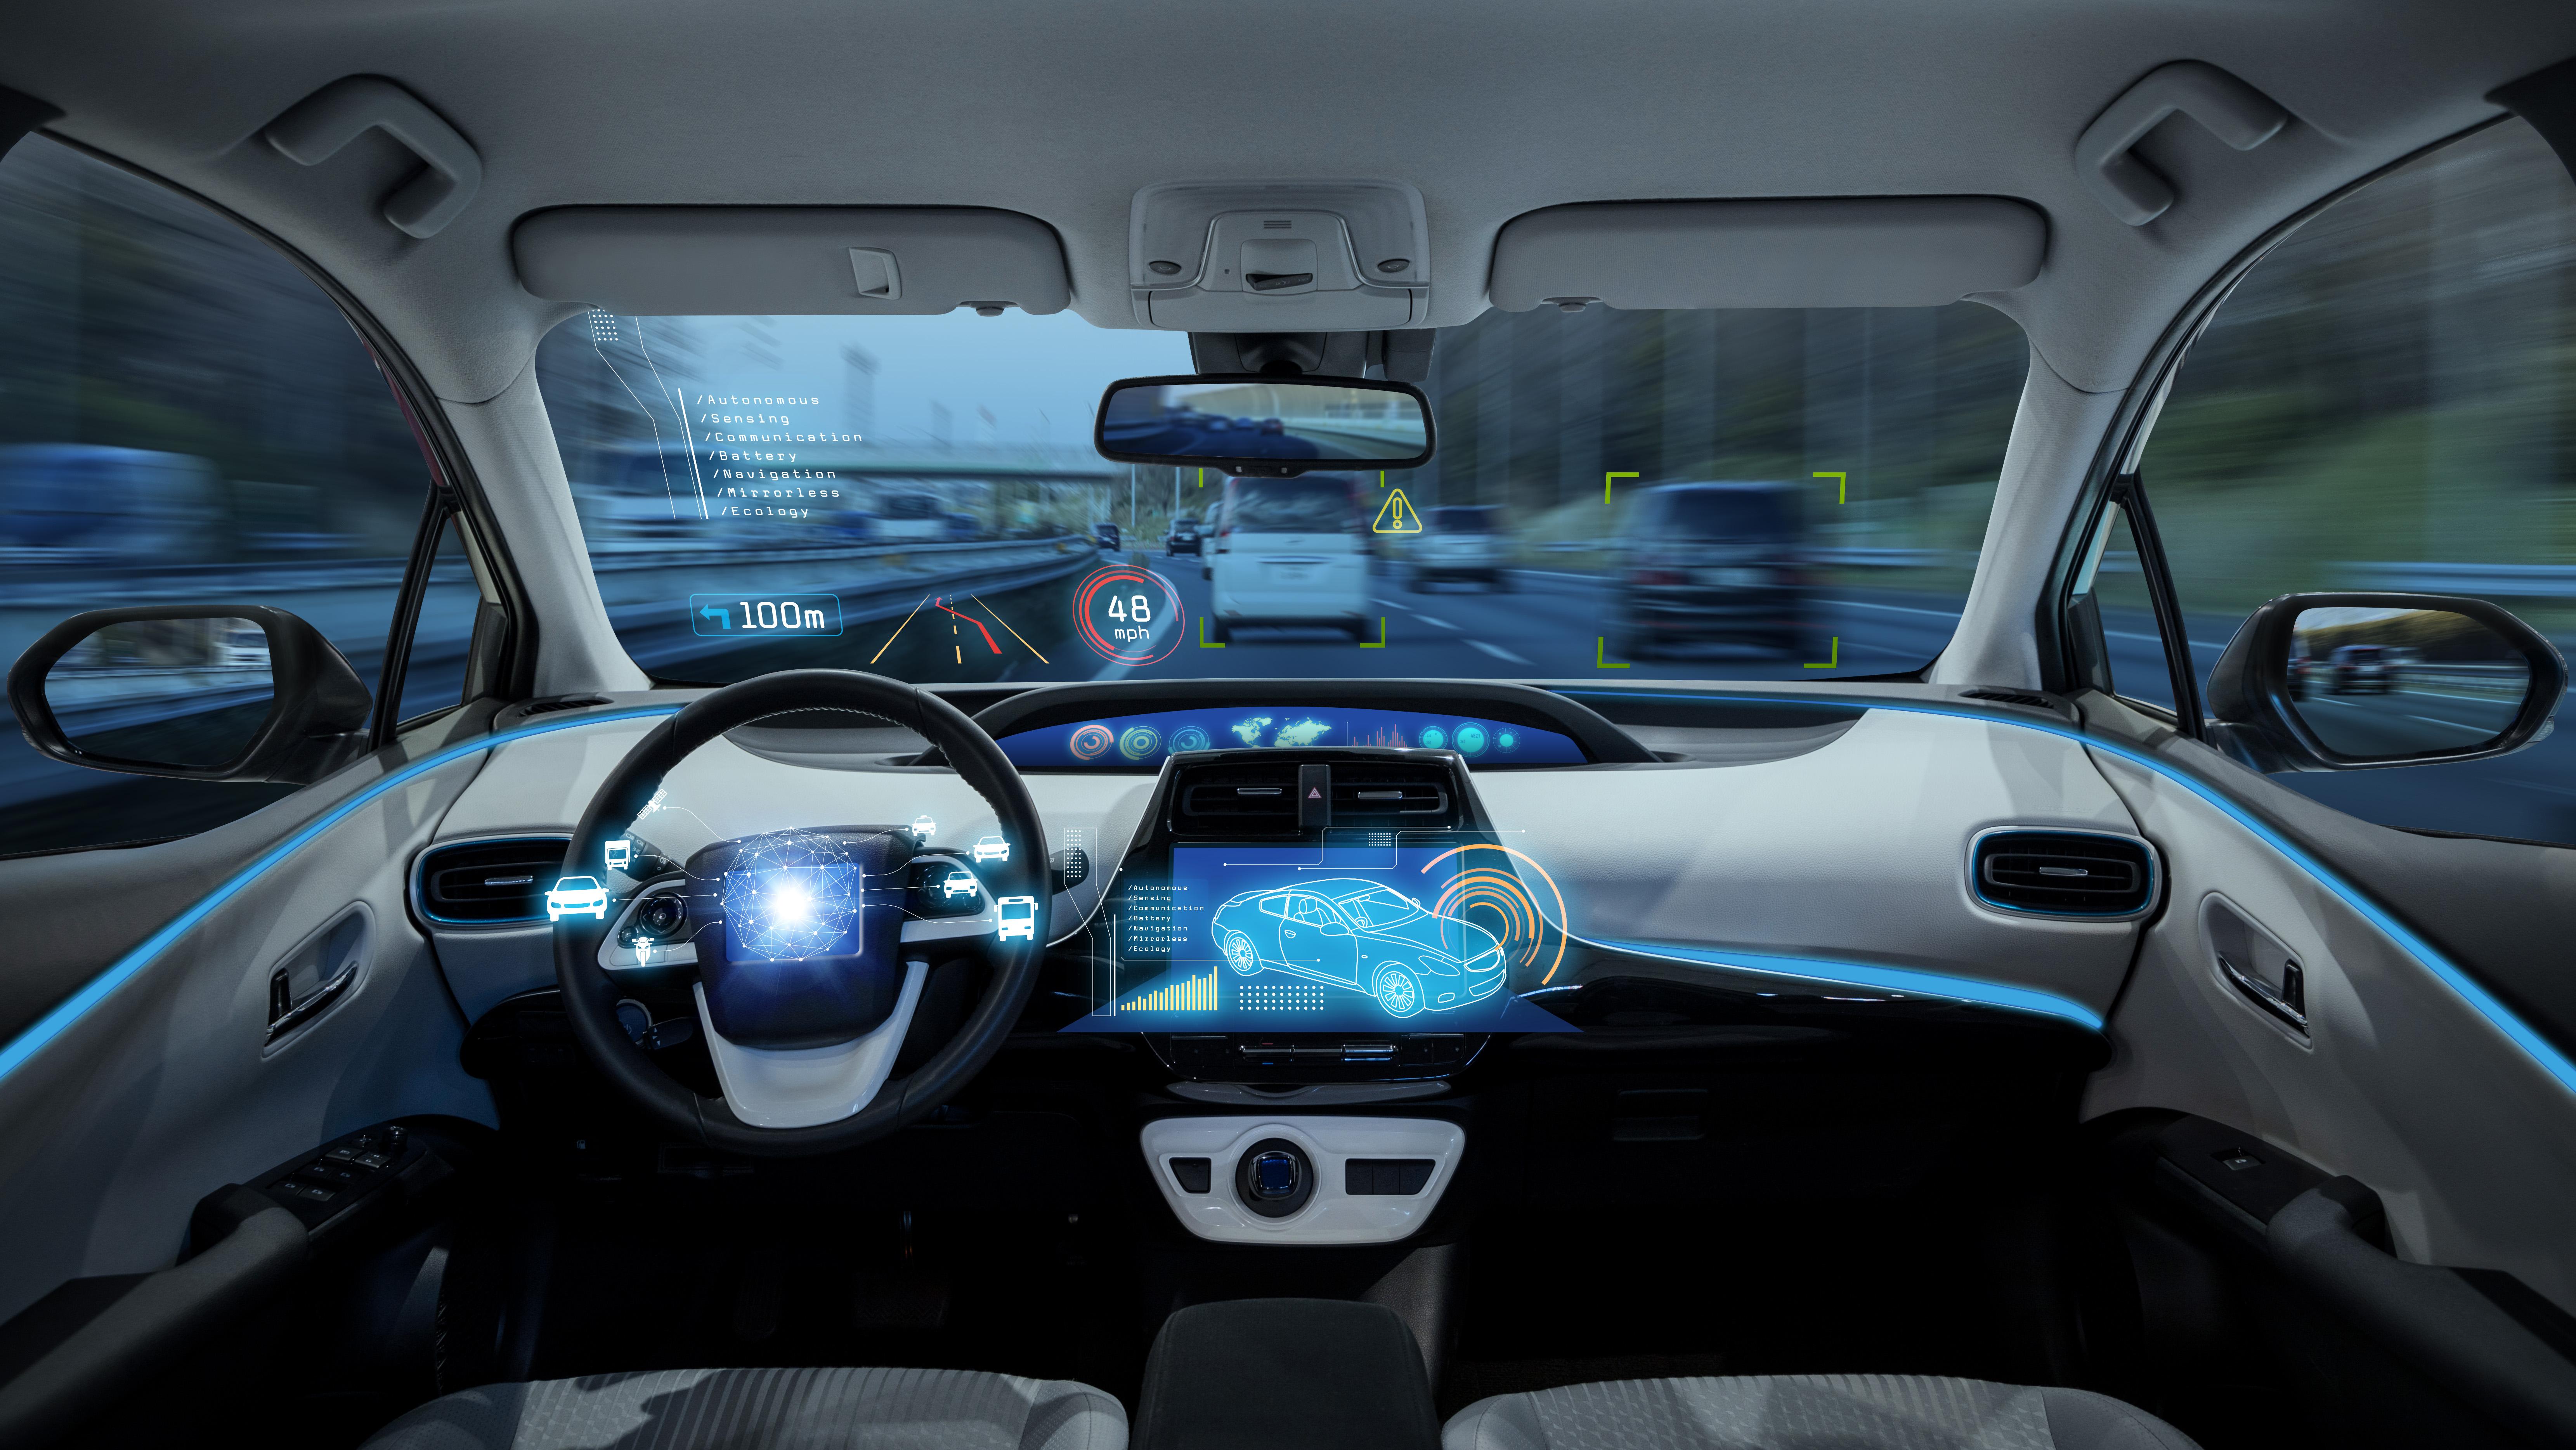 Inside of a driverless car cockpit.